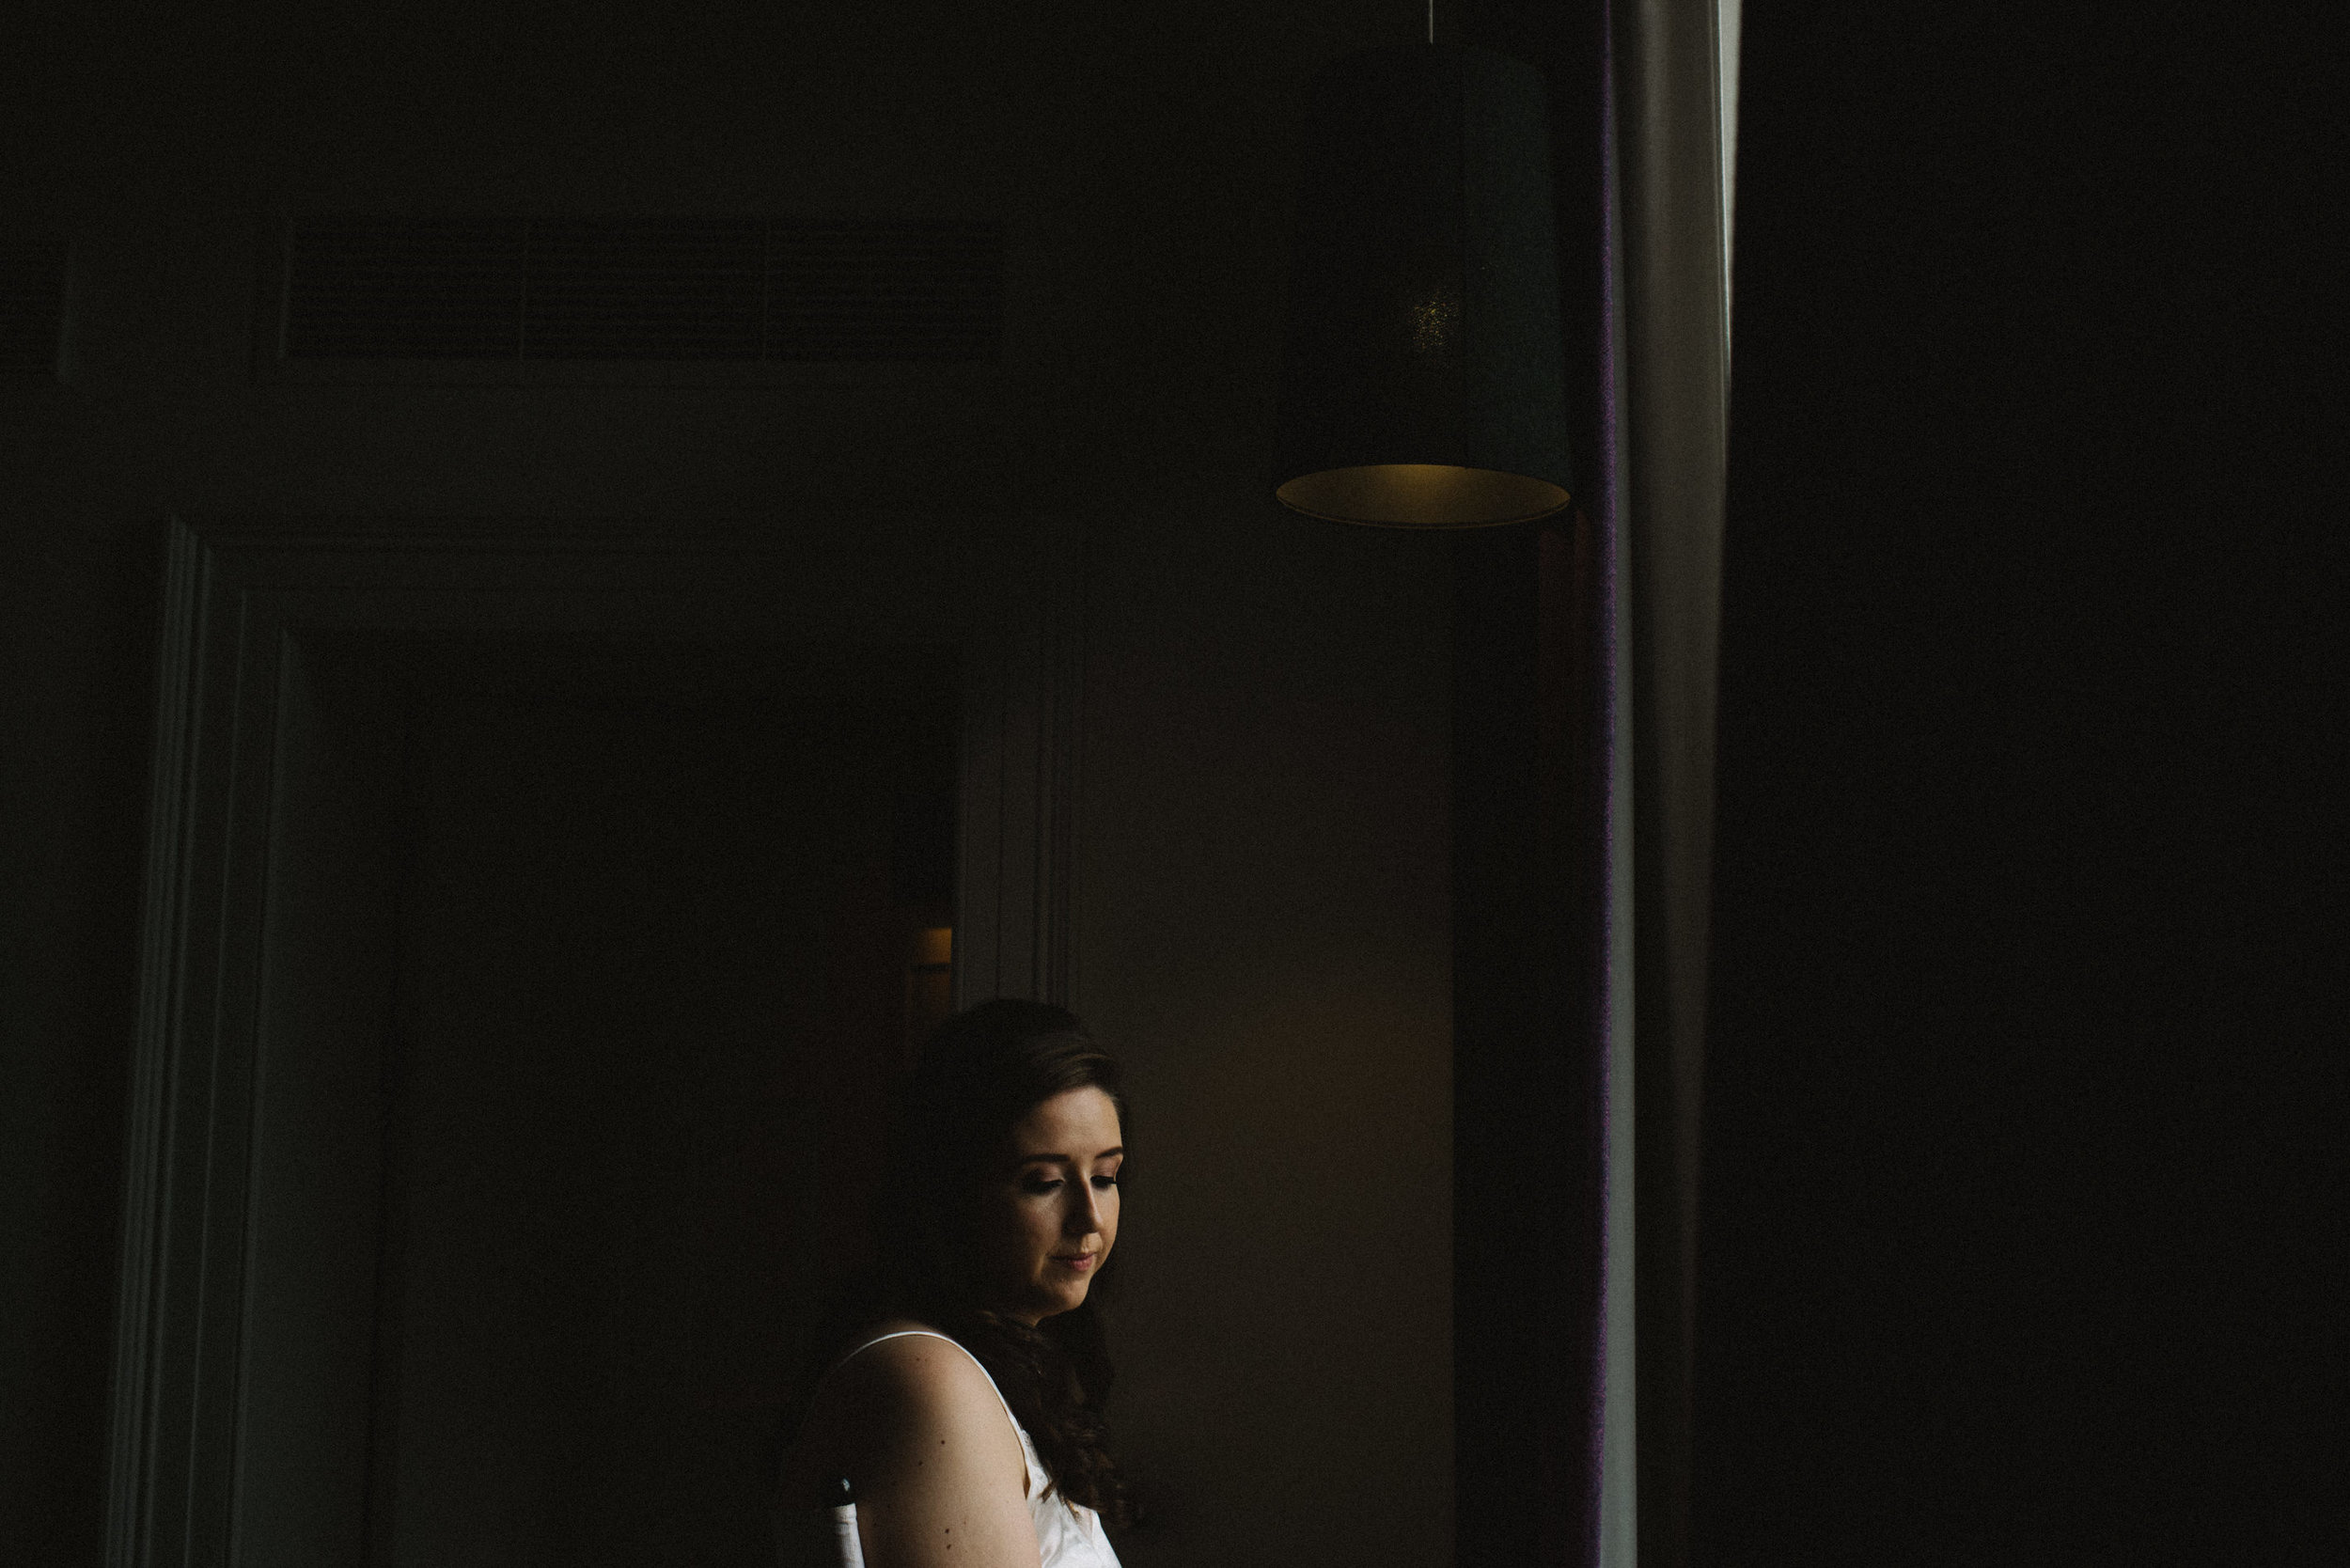 0012-LISA-DEVINE-PHOTOGRAPHY-ALTERNATIVE-WEDDING-PHOTOGRAPHY-SCOTLAND-DESTINATION-WEDDINGS-GLASGOW-WEDDINGS-COOL-WEDDINGS-STYLISH-WEDDINGS.JPG